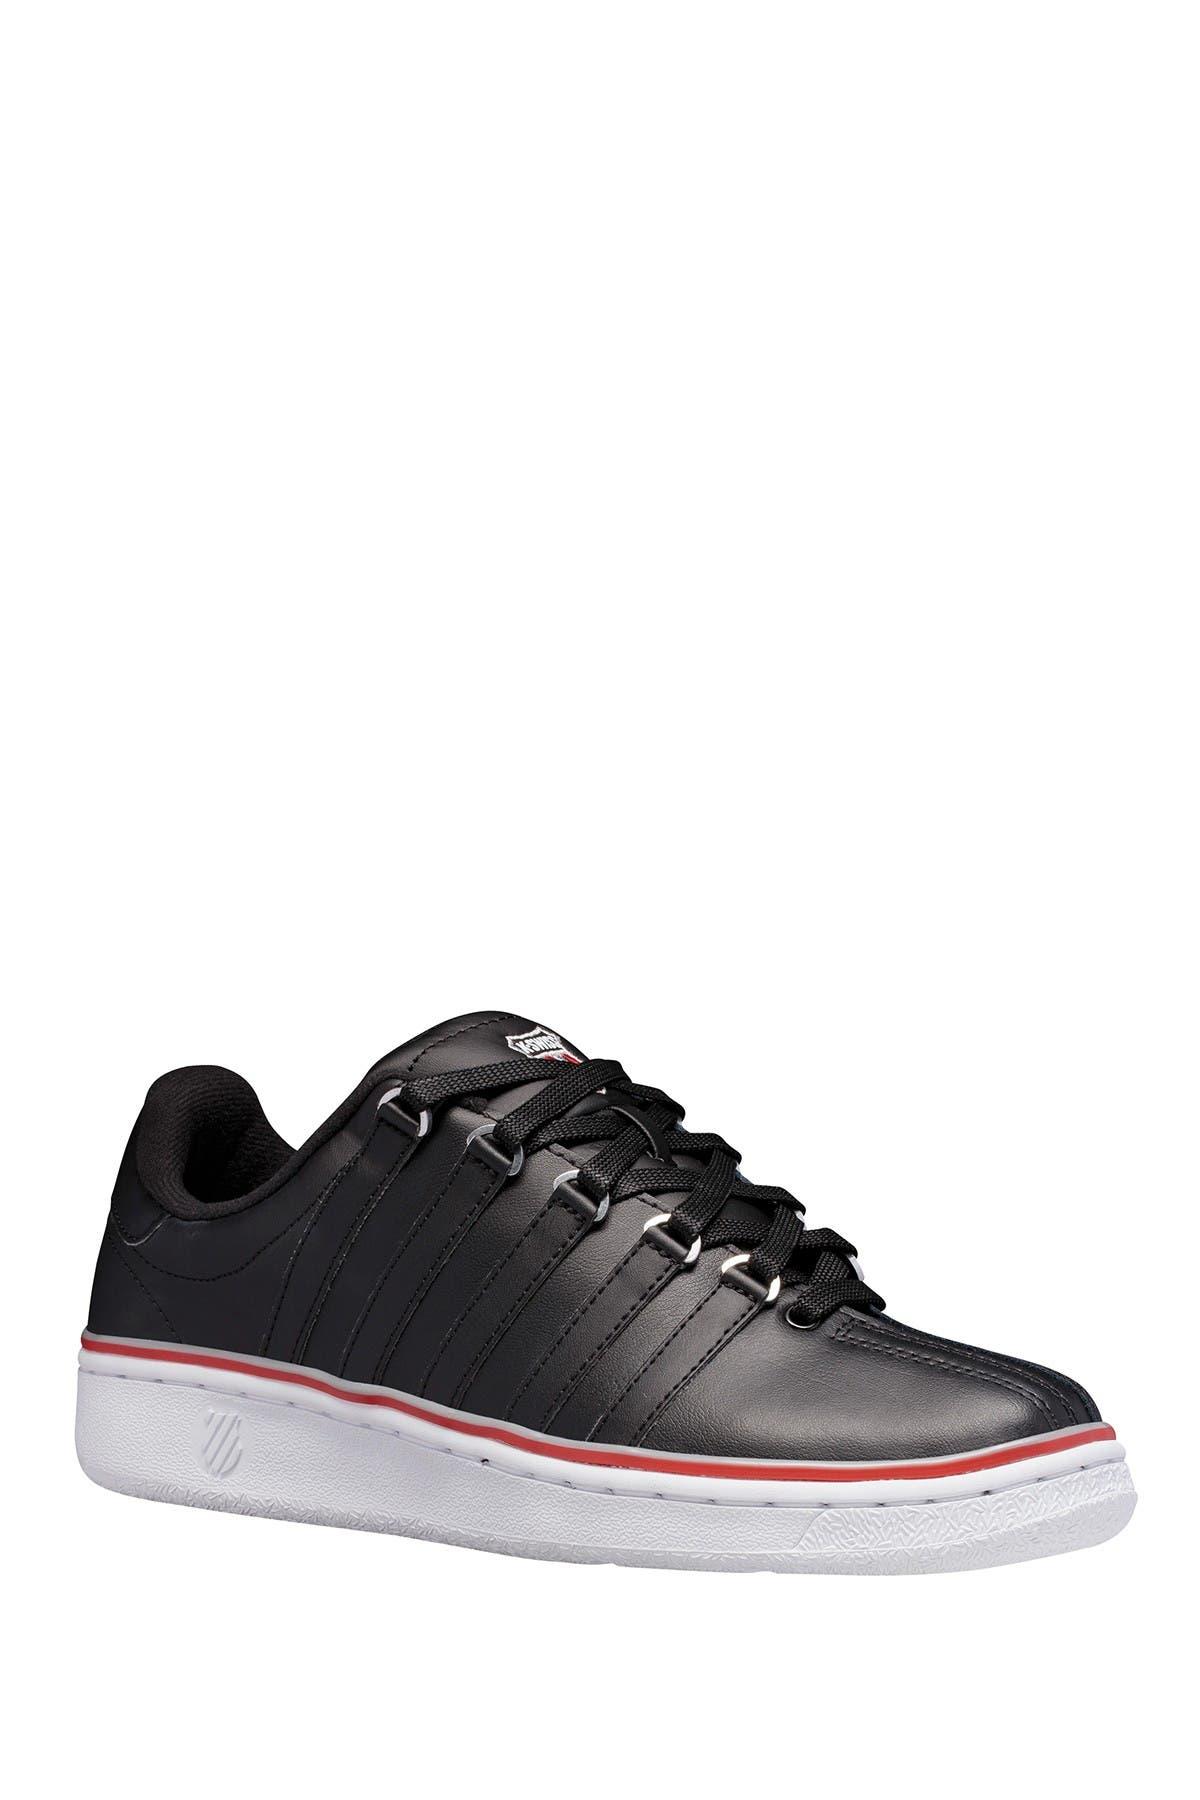 Image of K-Swiss Classic VN Sneaker